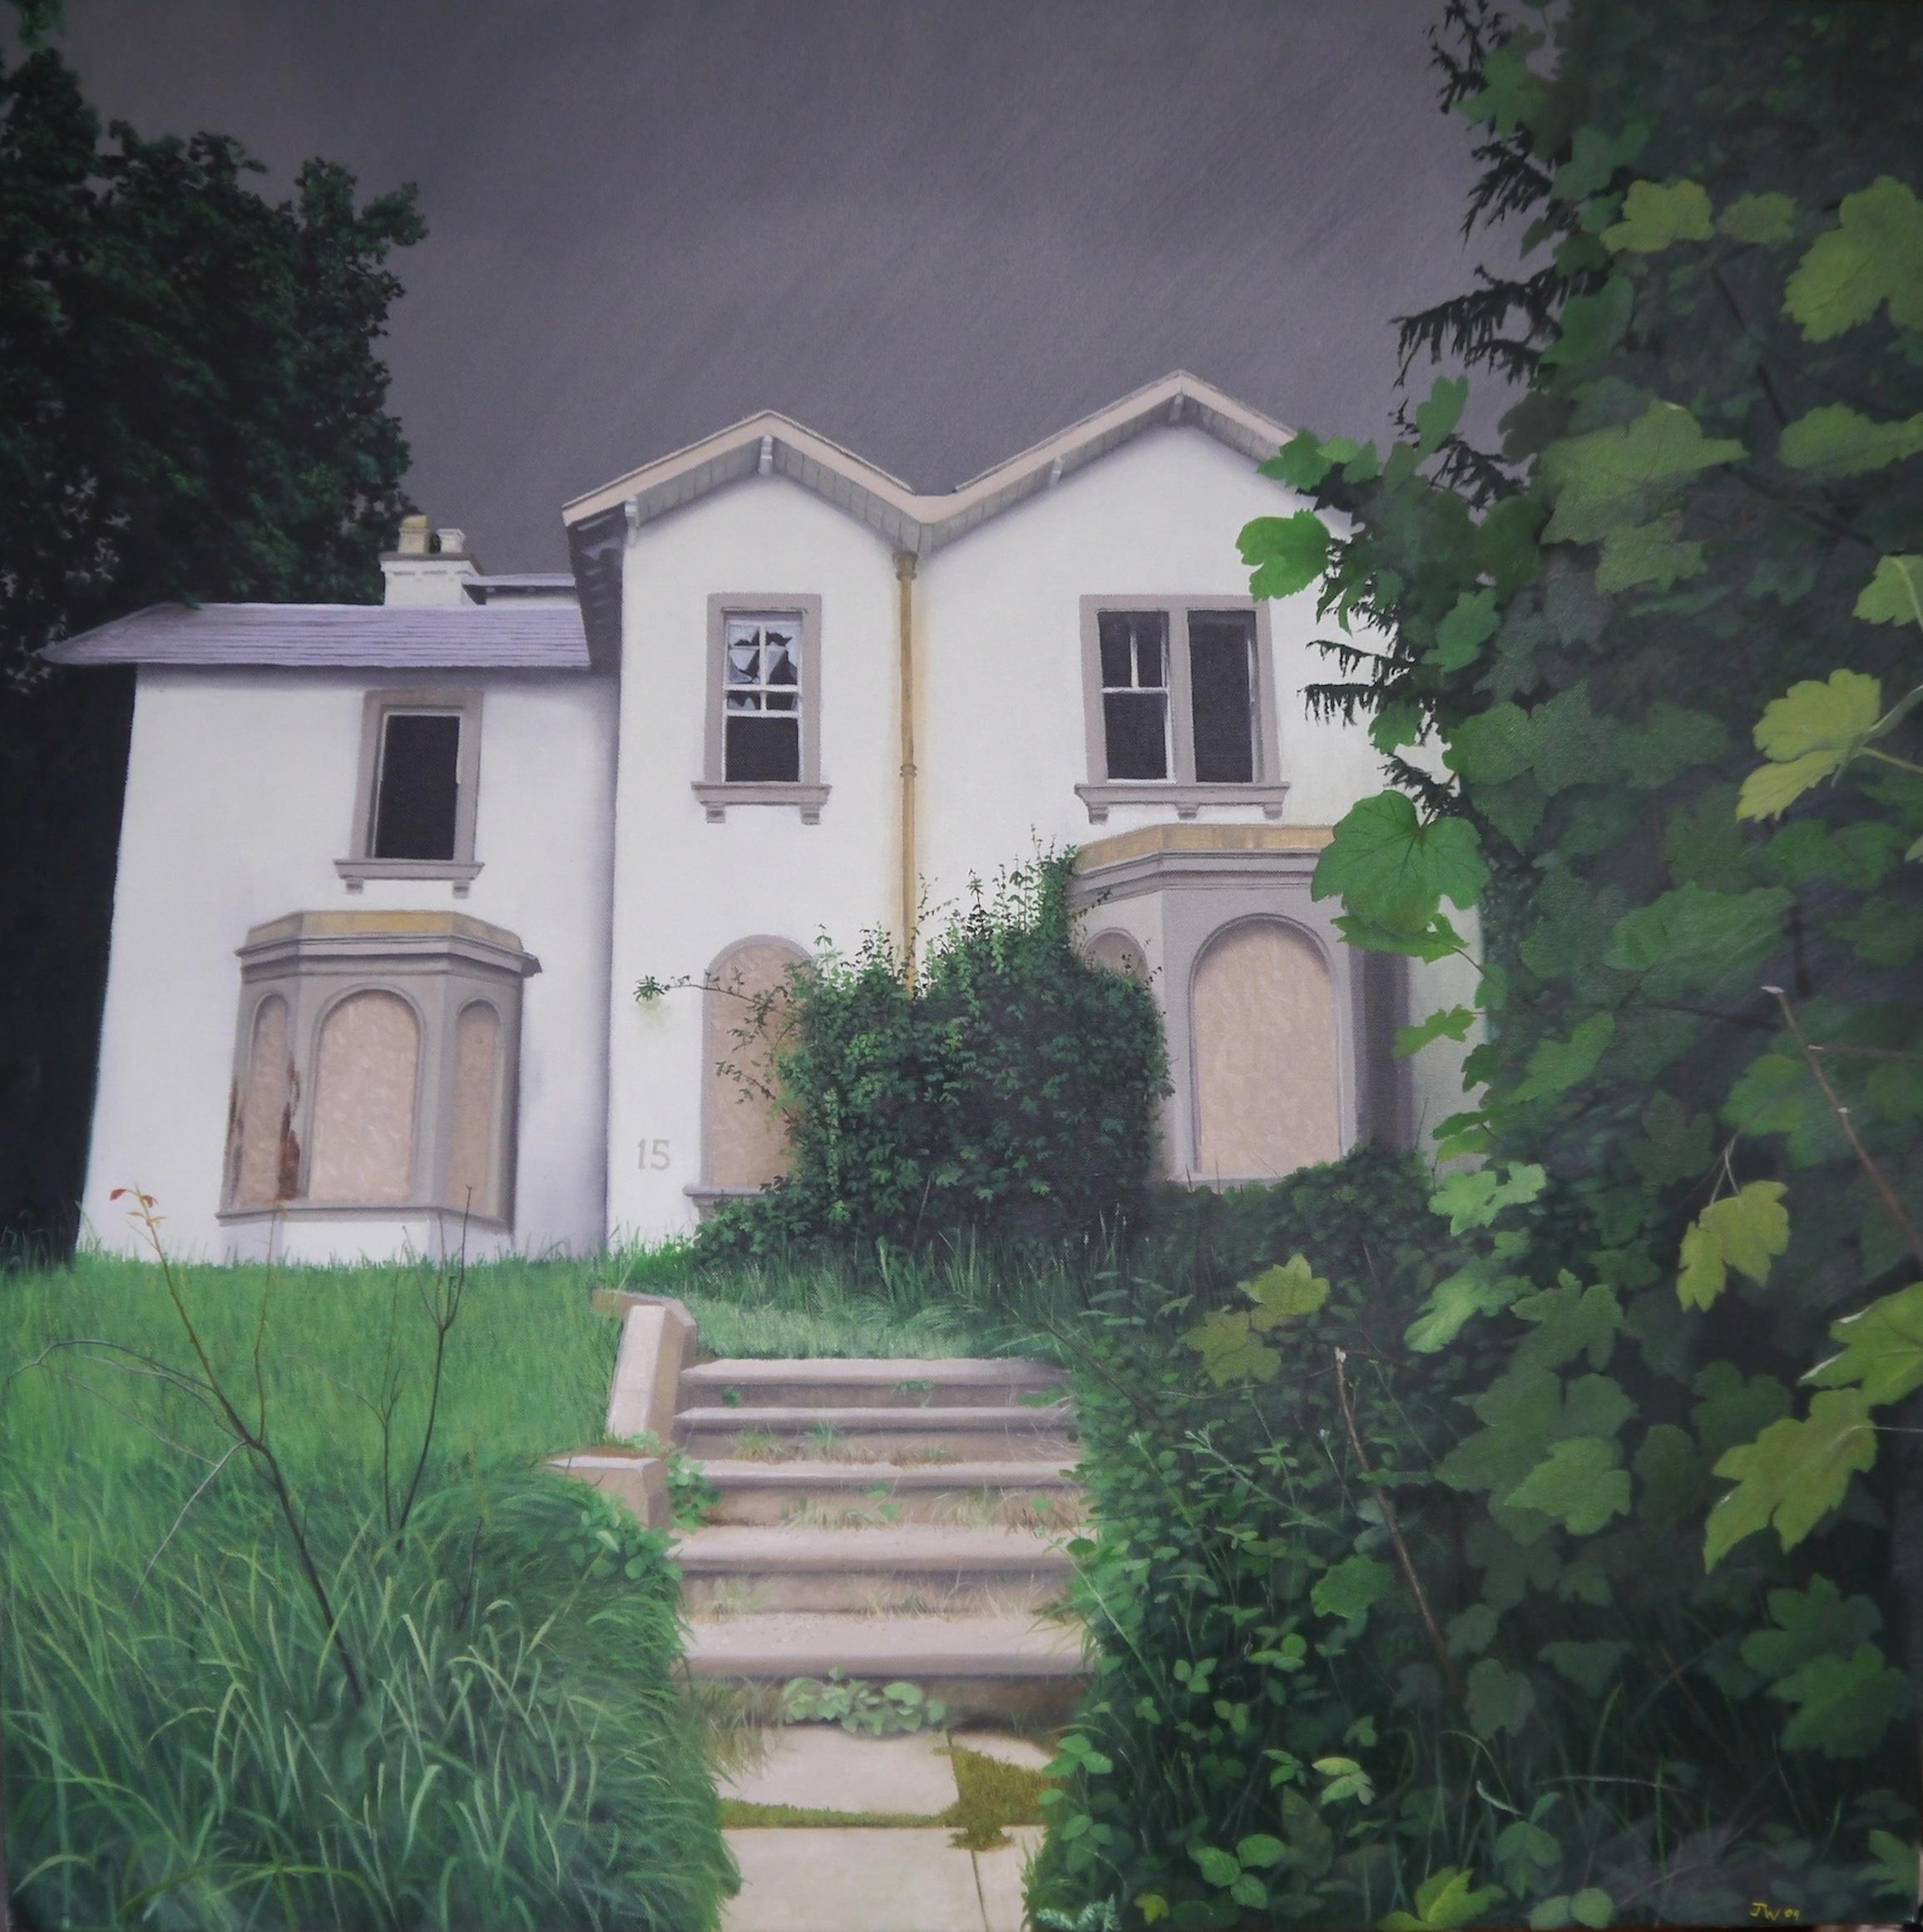 John Whitehill, Fifteen, Oils on canvas, 90 x 90 x 4,  http://johnwhitehill.co.uk